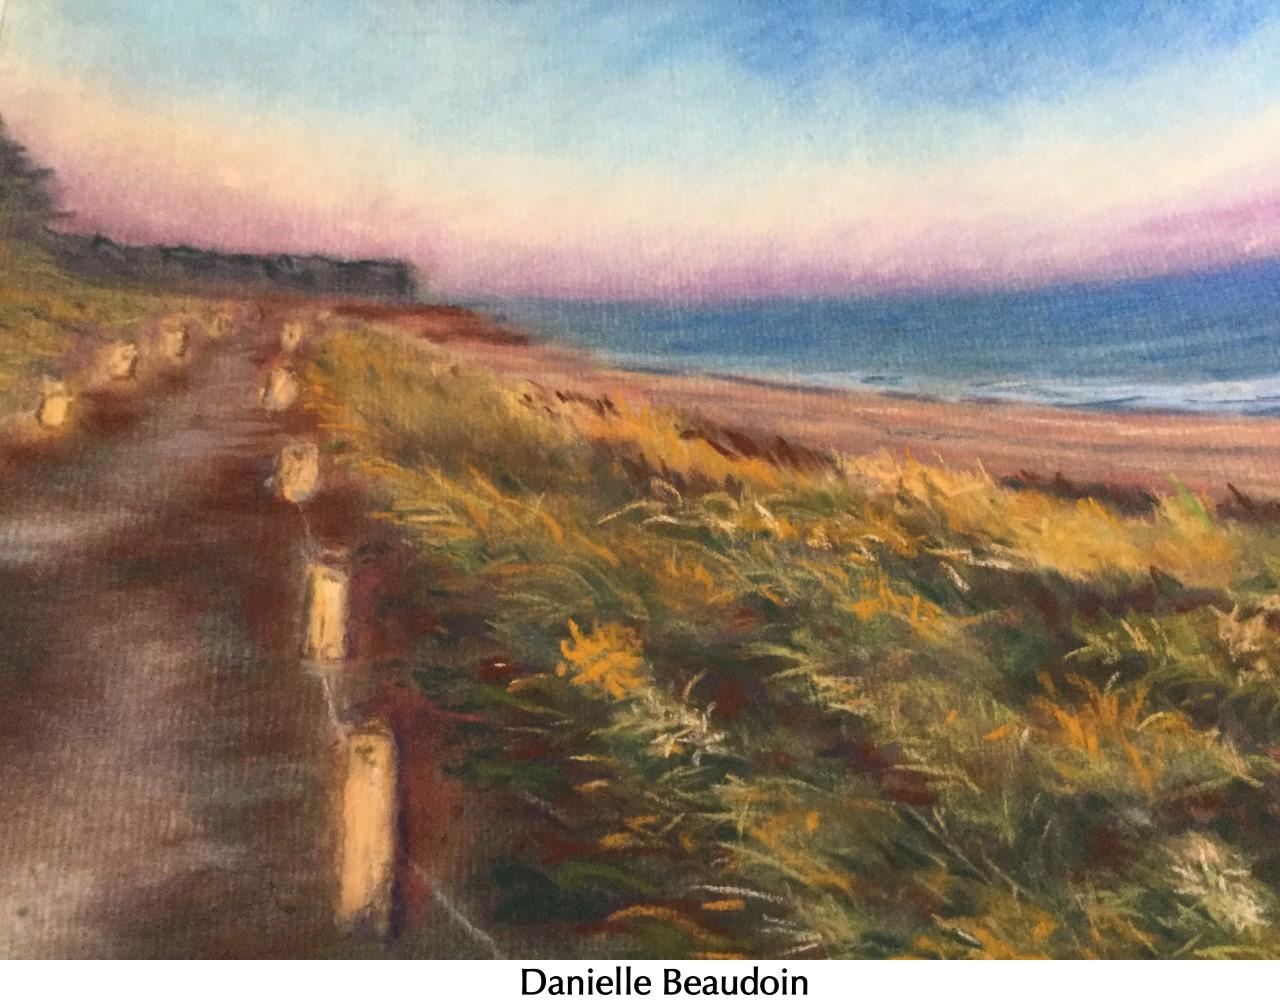 Danielle Beaudoin